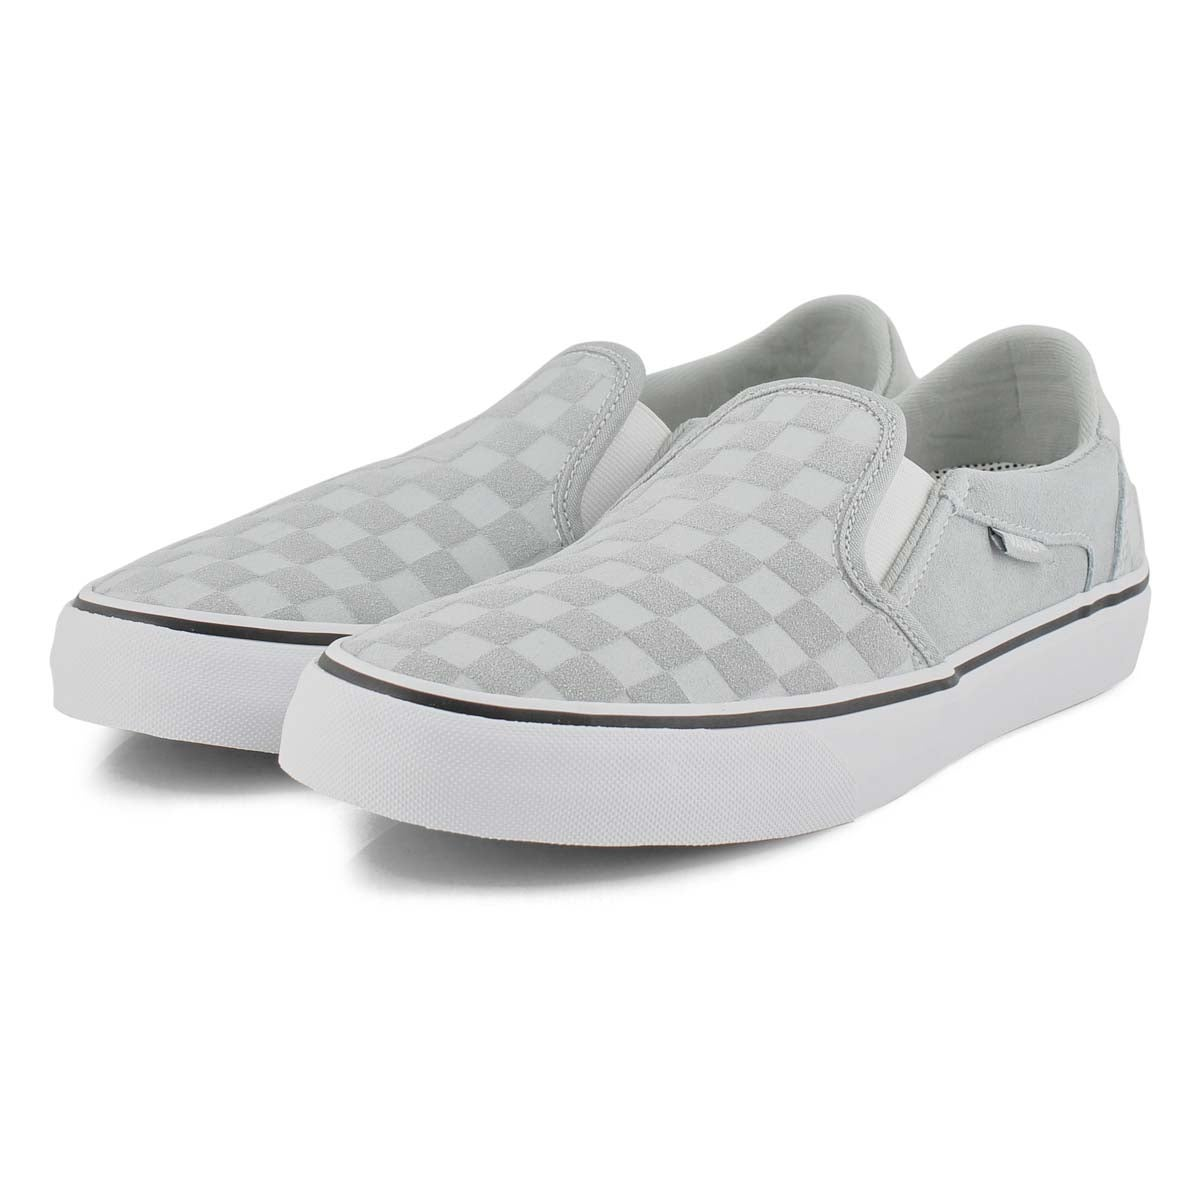 Women's Asher Deluxe Sneaker - Gray